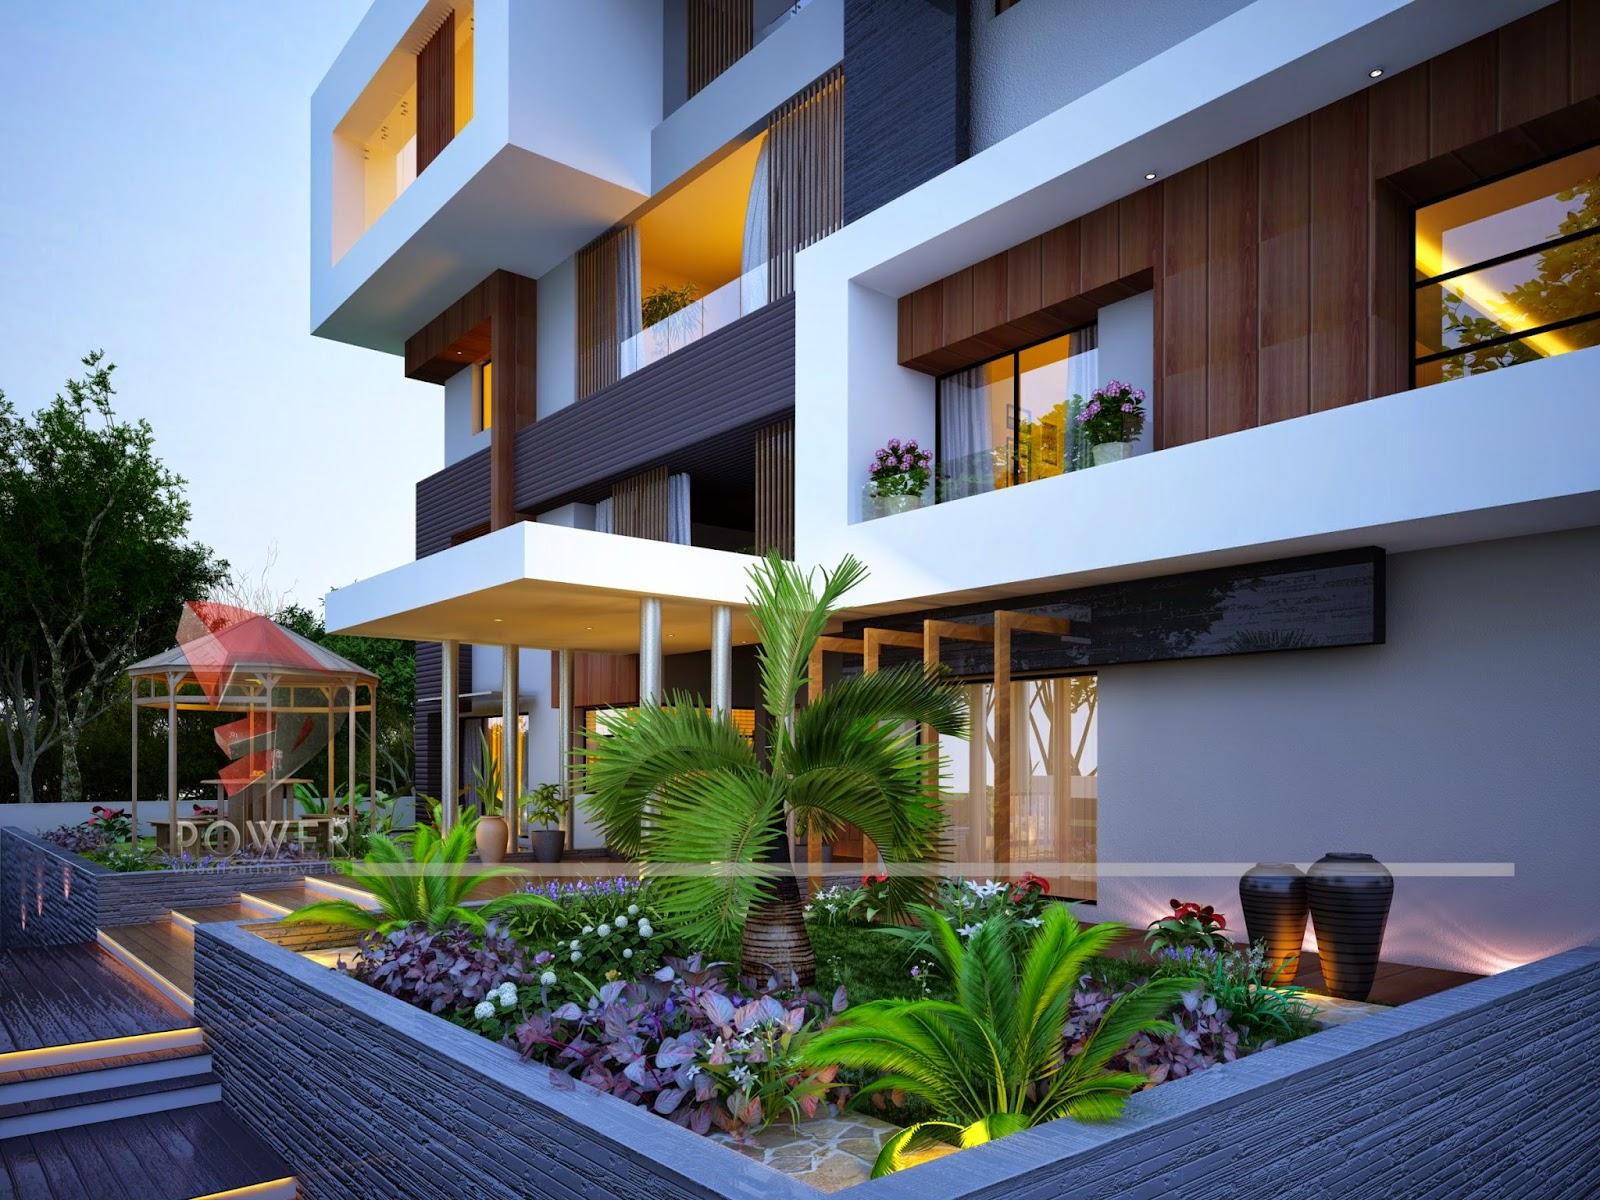 Ultra Modern Home Designs | Home Designs: House 3D ...